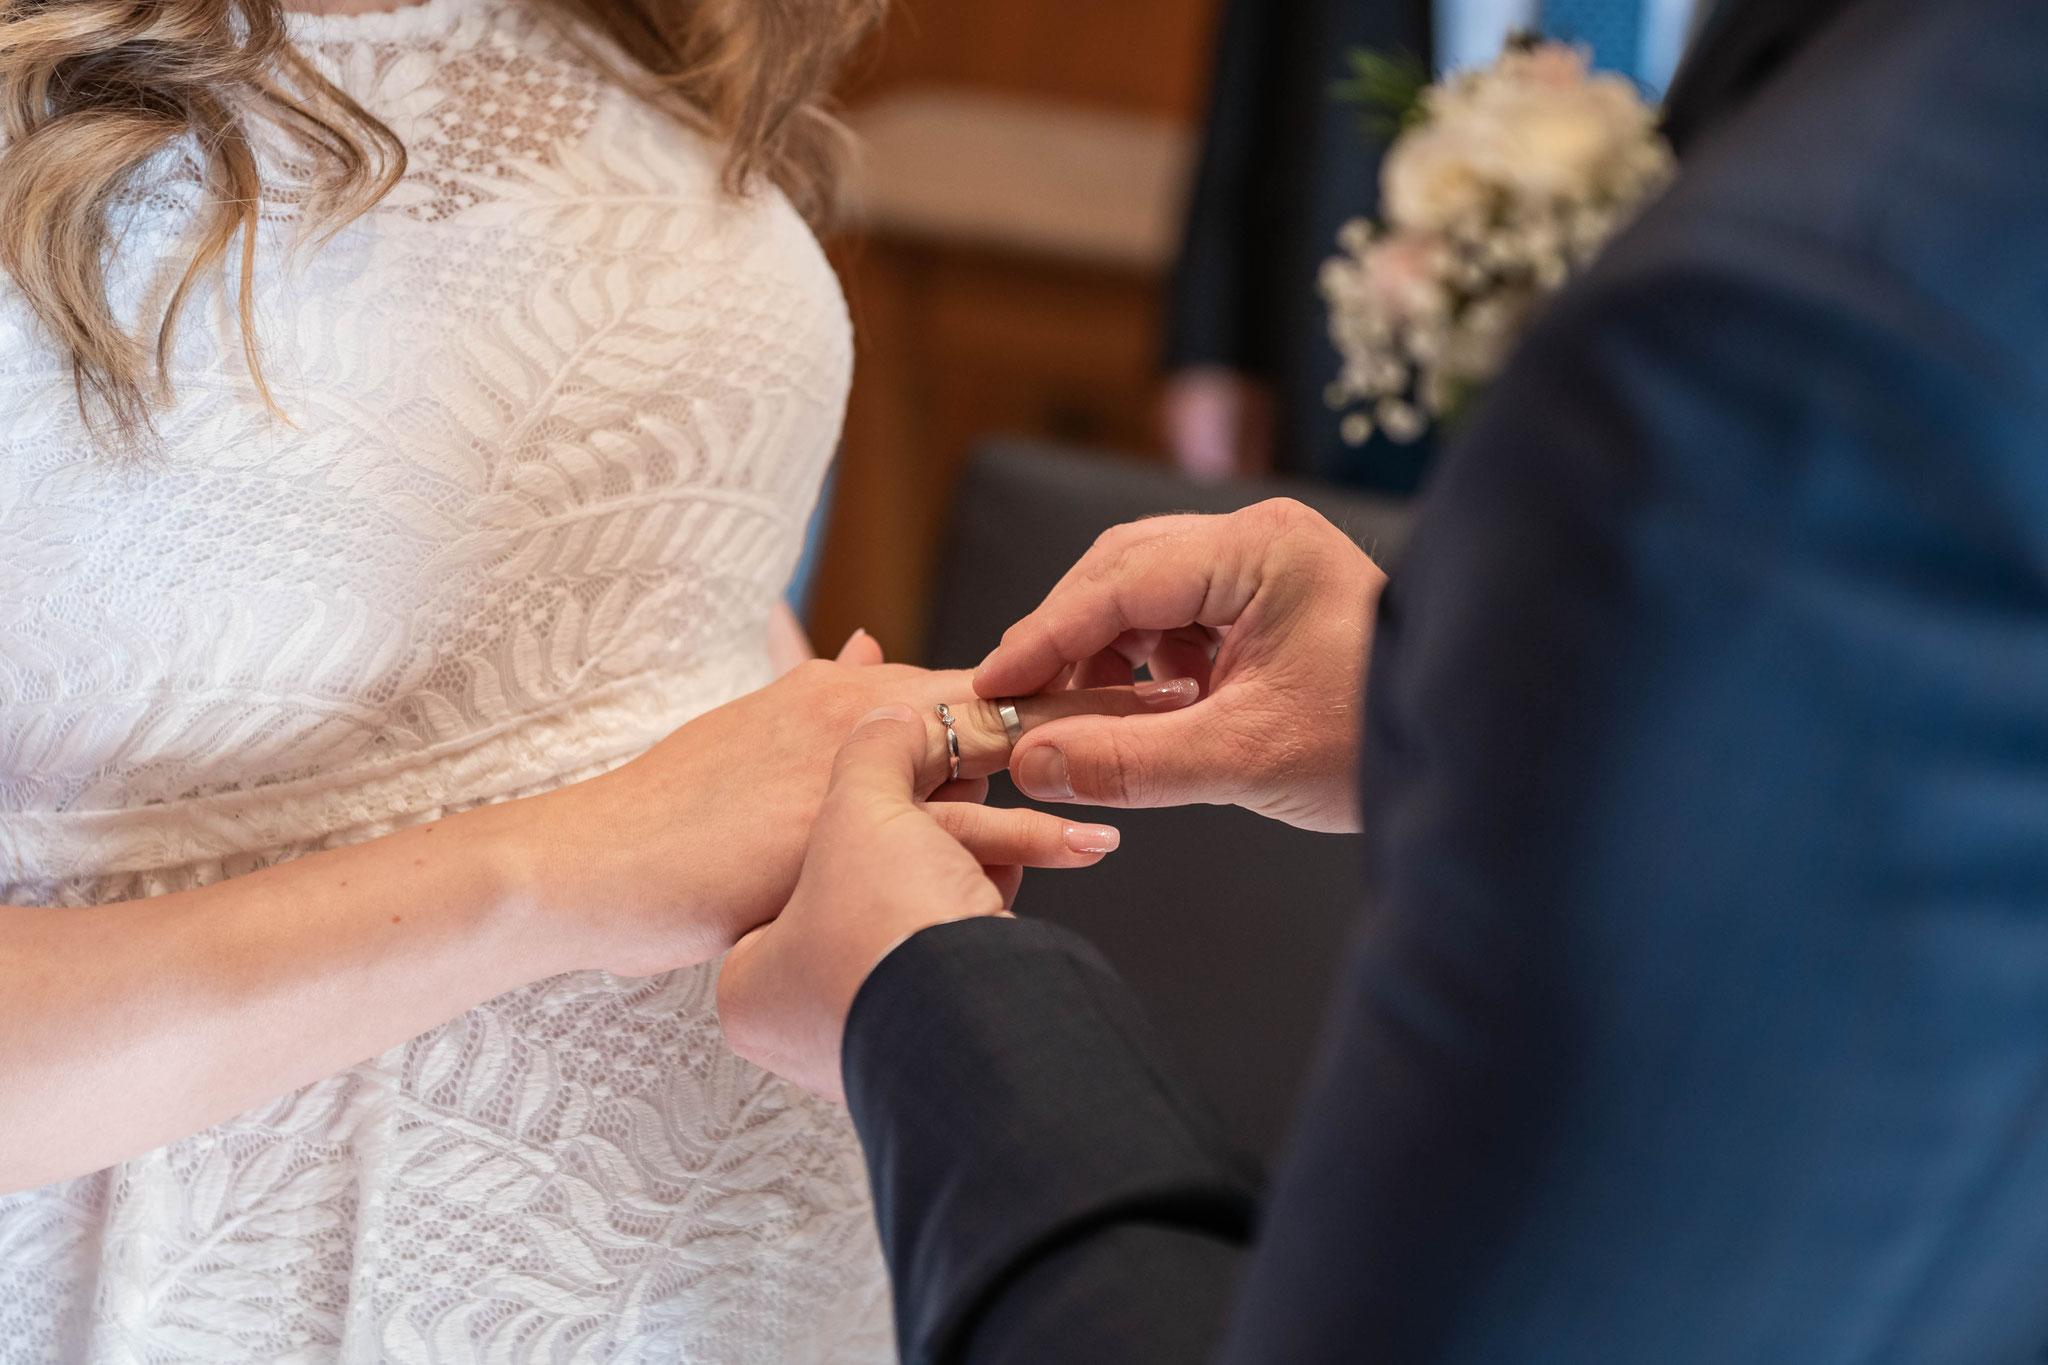 Bräutigam steckt seiner Braut den Heiratsring an den Finger